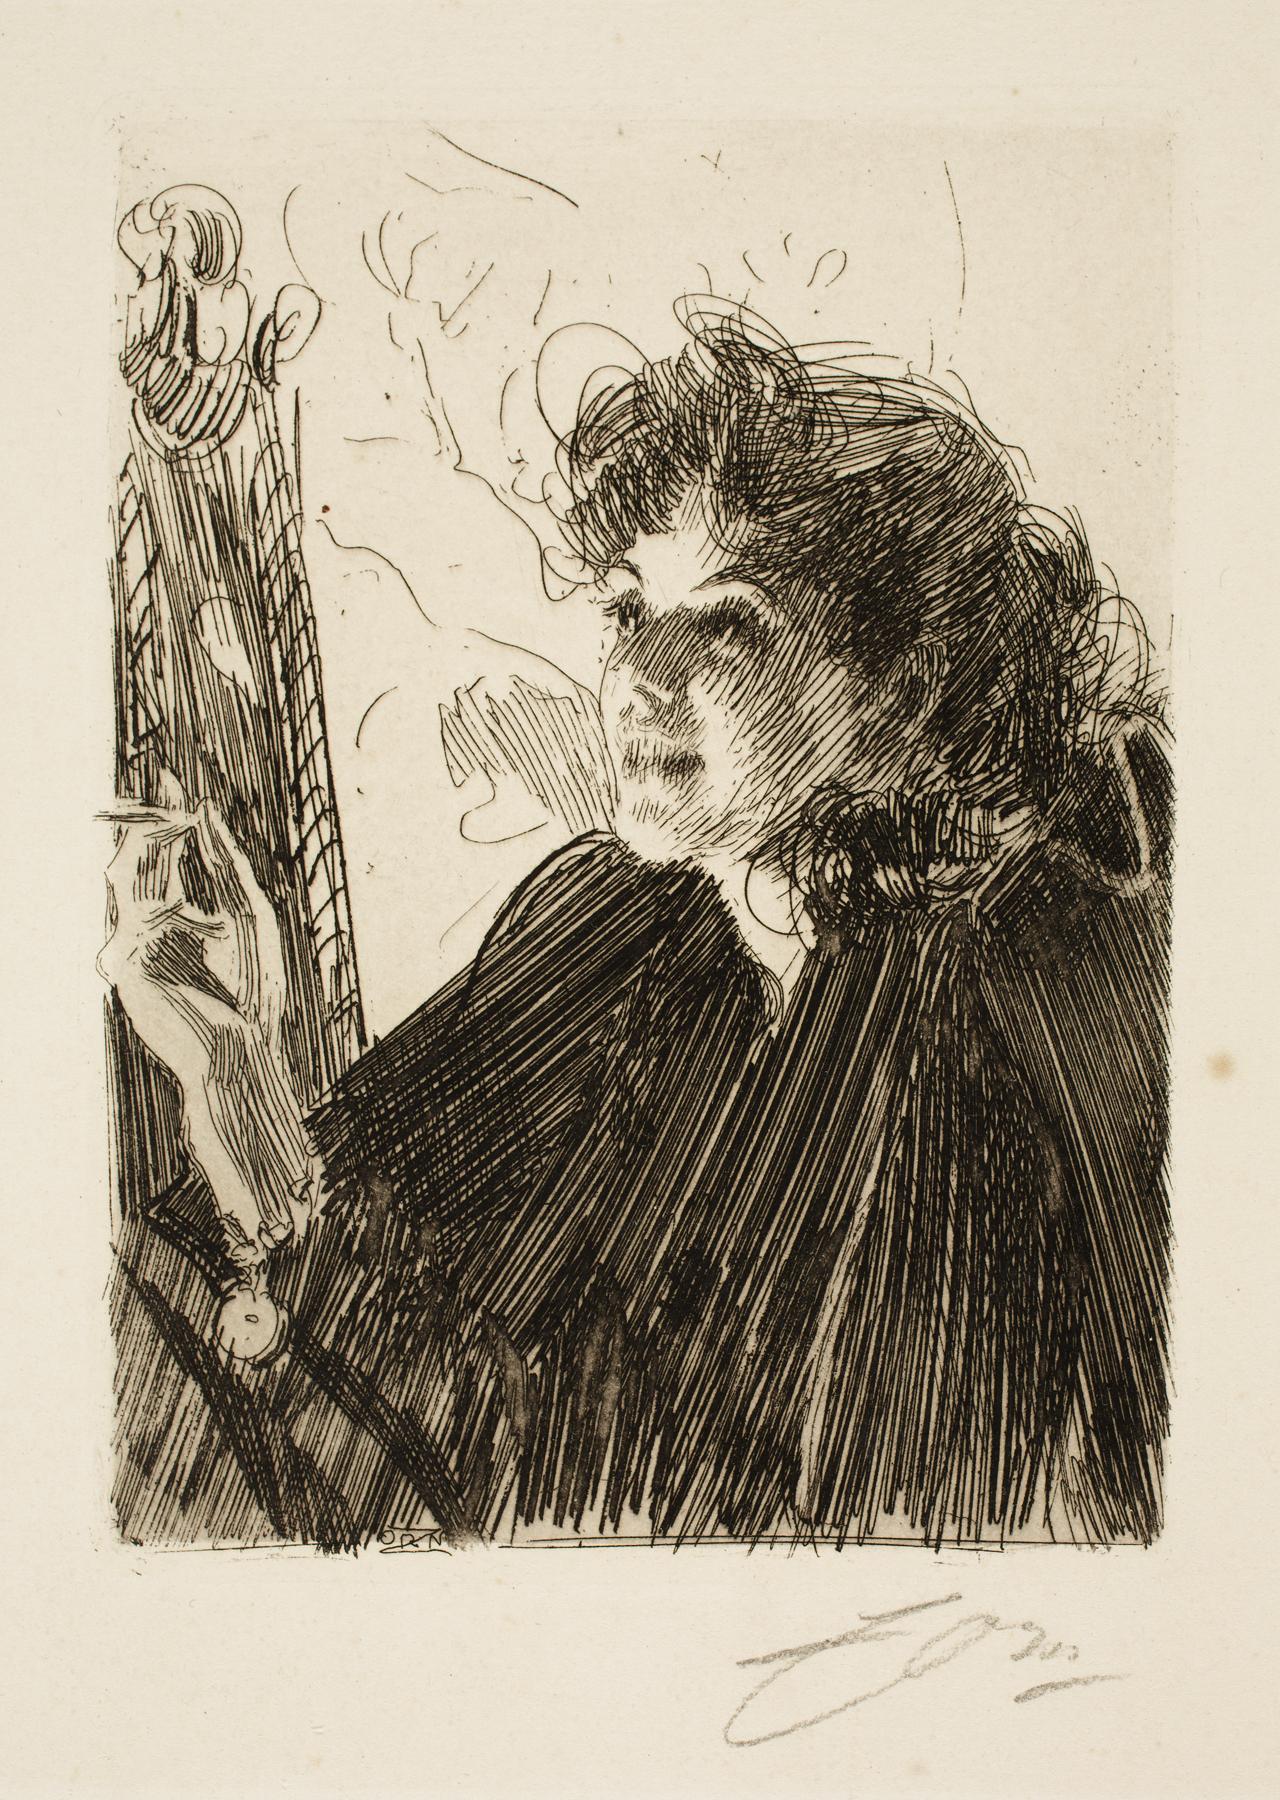 Anders Leonard Zorn (Swedish, 1860–1920), Girl With A Cigarette II, 1891. Etching. Milwaukee Art Museum, Gertrude Nunnemacher Schuchardt Collection, presented by William H. Schuchardt M1924.131. Photo credit: John R. Glembin.